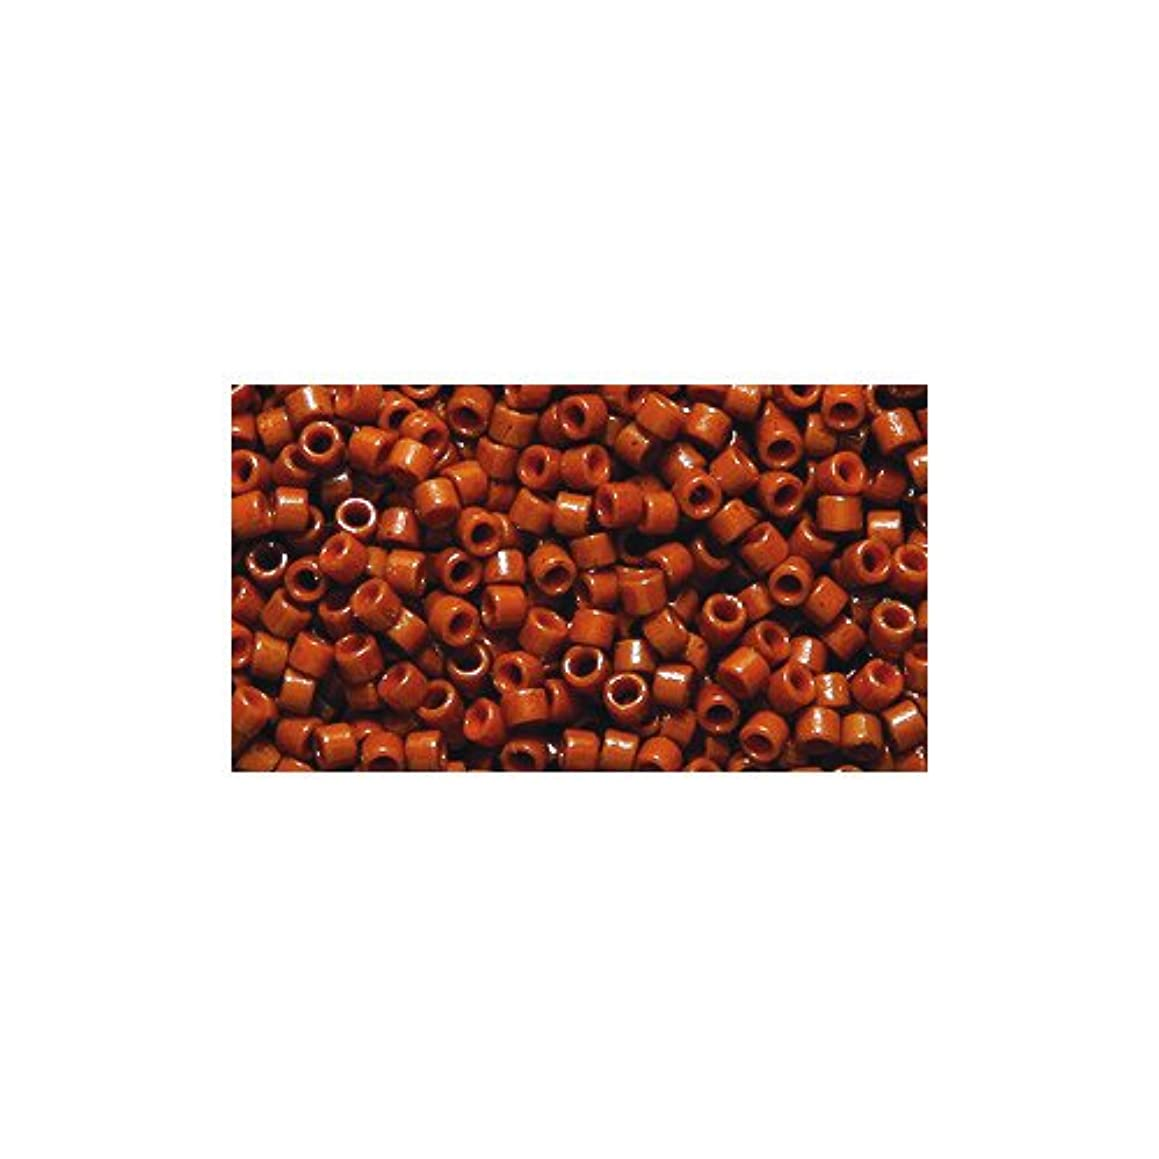 Miyuki Delica Seed Bead 11/0 DB2109, Duracoat Opaque Sienna, 9-Gram/Pack